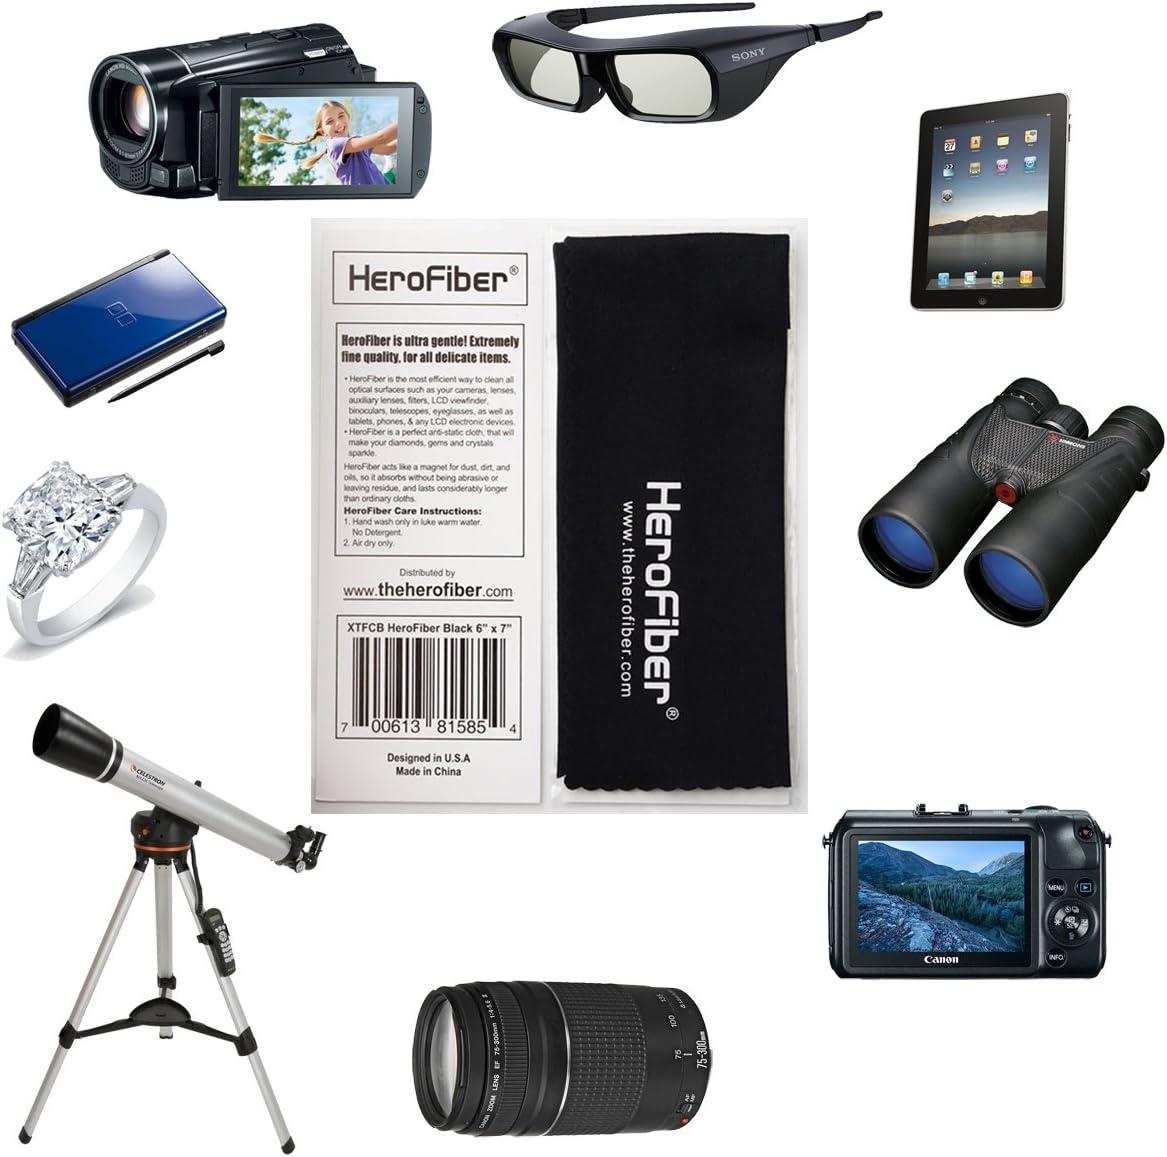 NEX-F3 Interchangeable Lens Digital Cameras w Ultra Gentle Cleaning Cloth HeroFiber 60 Pro Series Lightweight Photo//Video Tripod /& Carrying Case for Sony Alpha NEX-3N NEX-5T NEX-5R